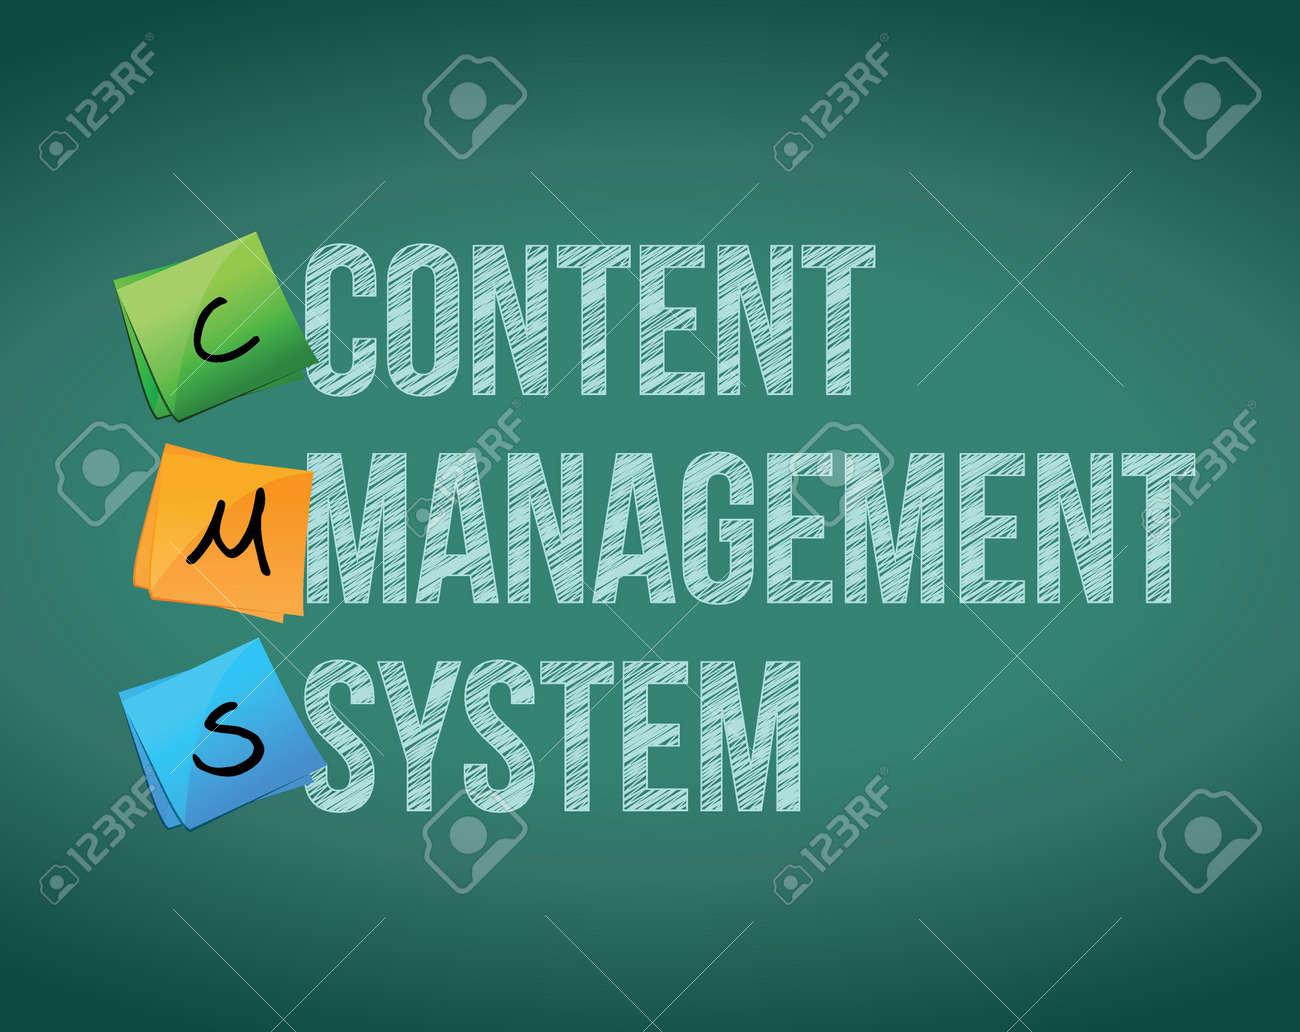 Content Management System illustration design over a white background - 17824011